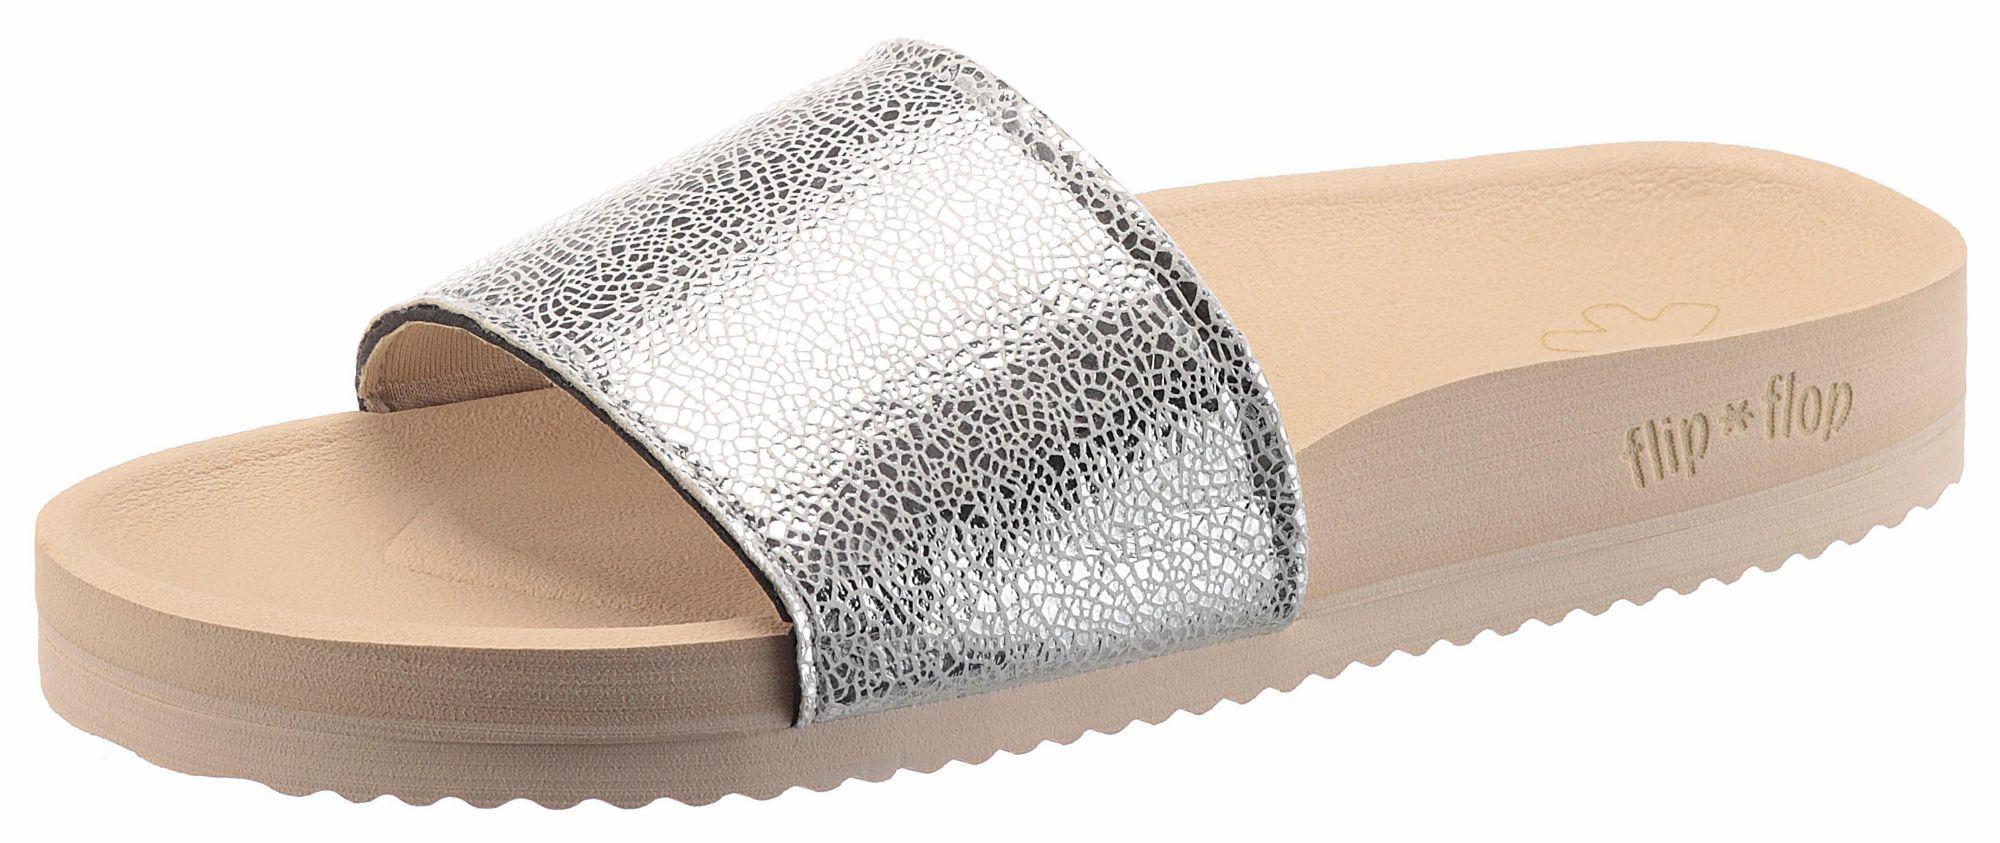 FLIPFLOP Flip Flop Pantolette »Pool Metallic Cracked«